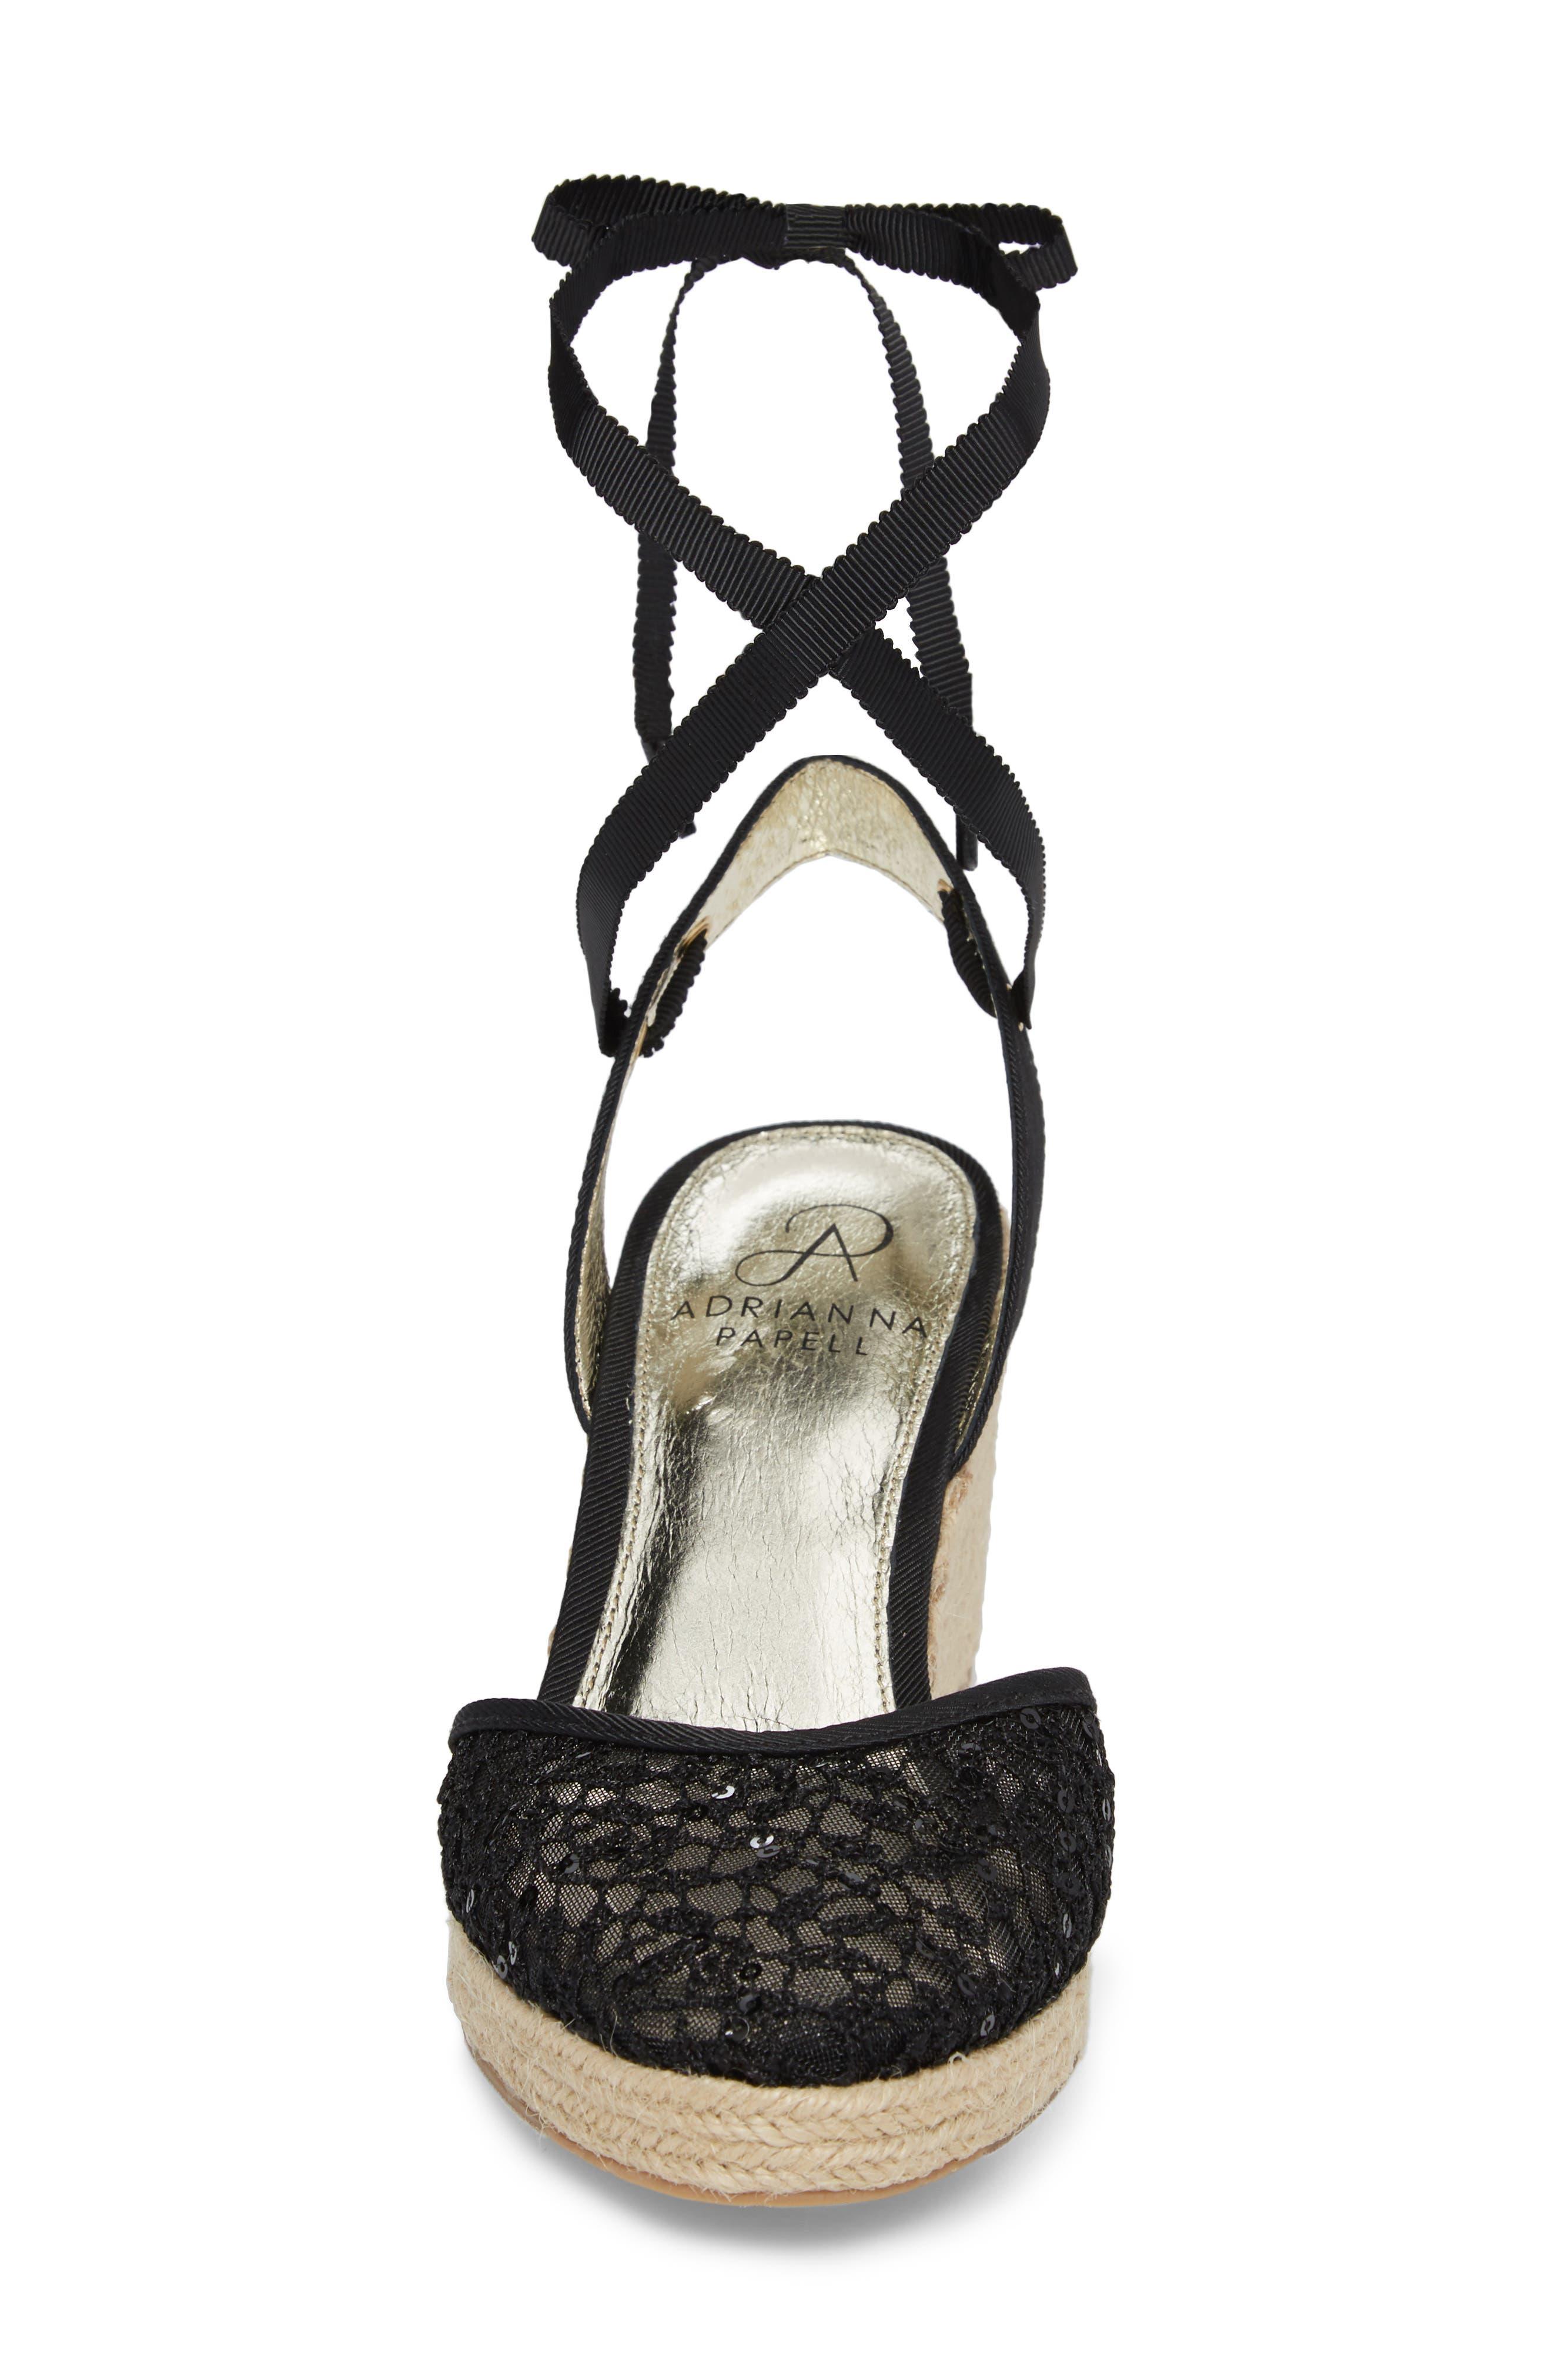 ADRIANNA PAPELL, Pamela Espadrille Wedge Sandal, Alternate thumbnail 4, color, BLACK LACE FABRIC